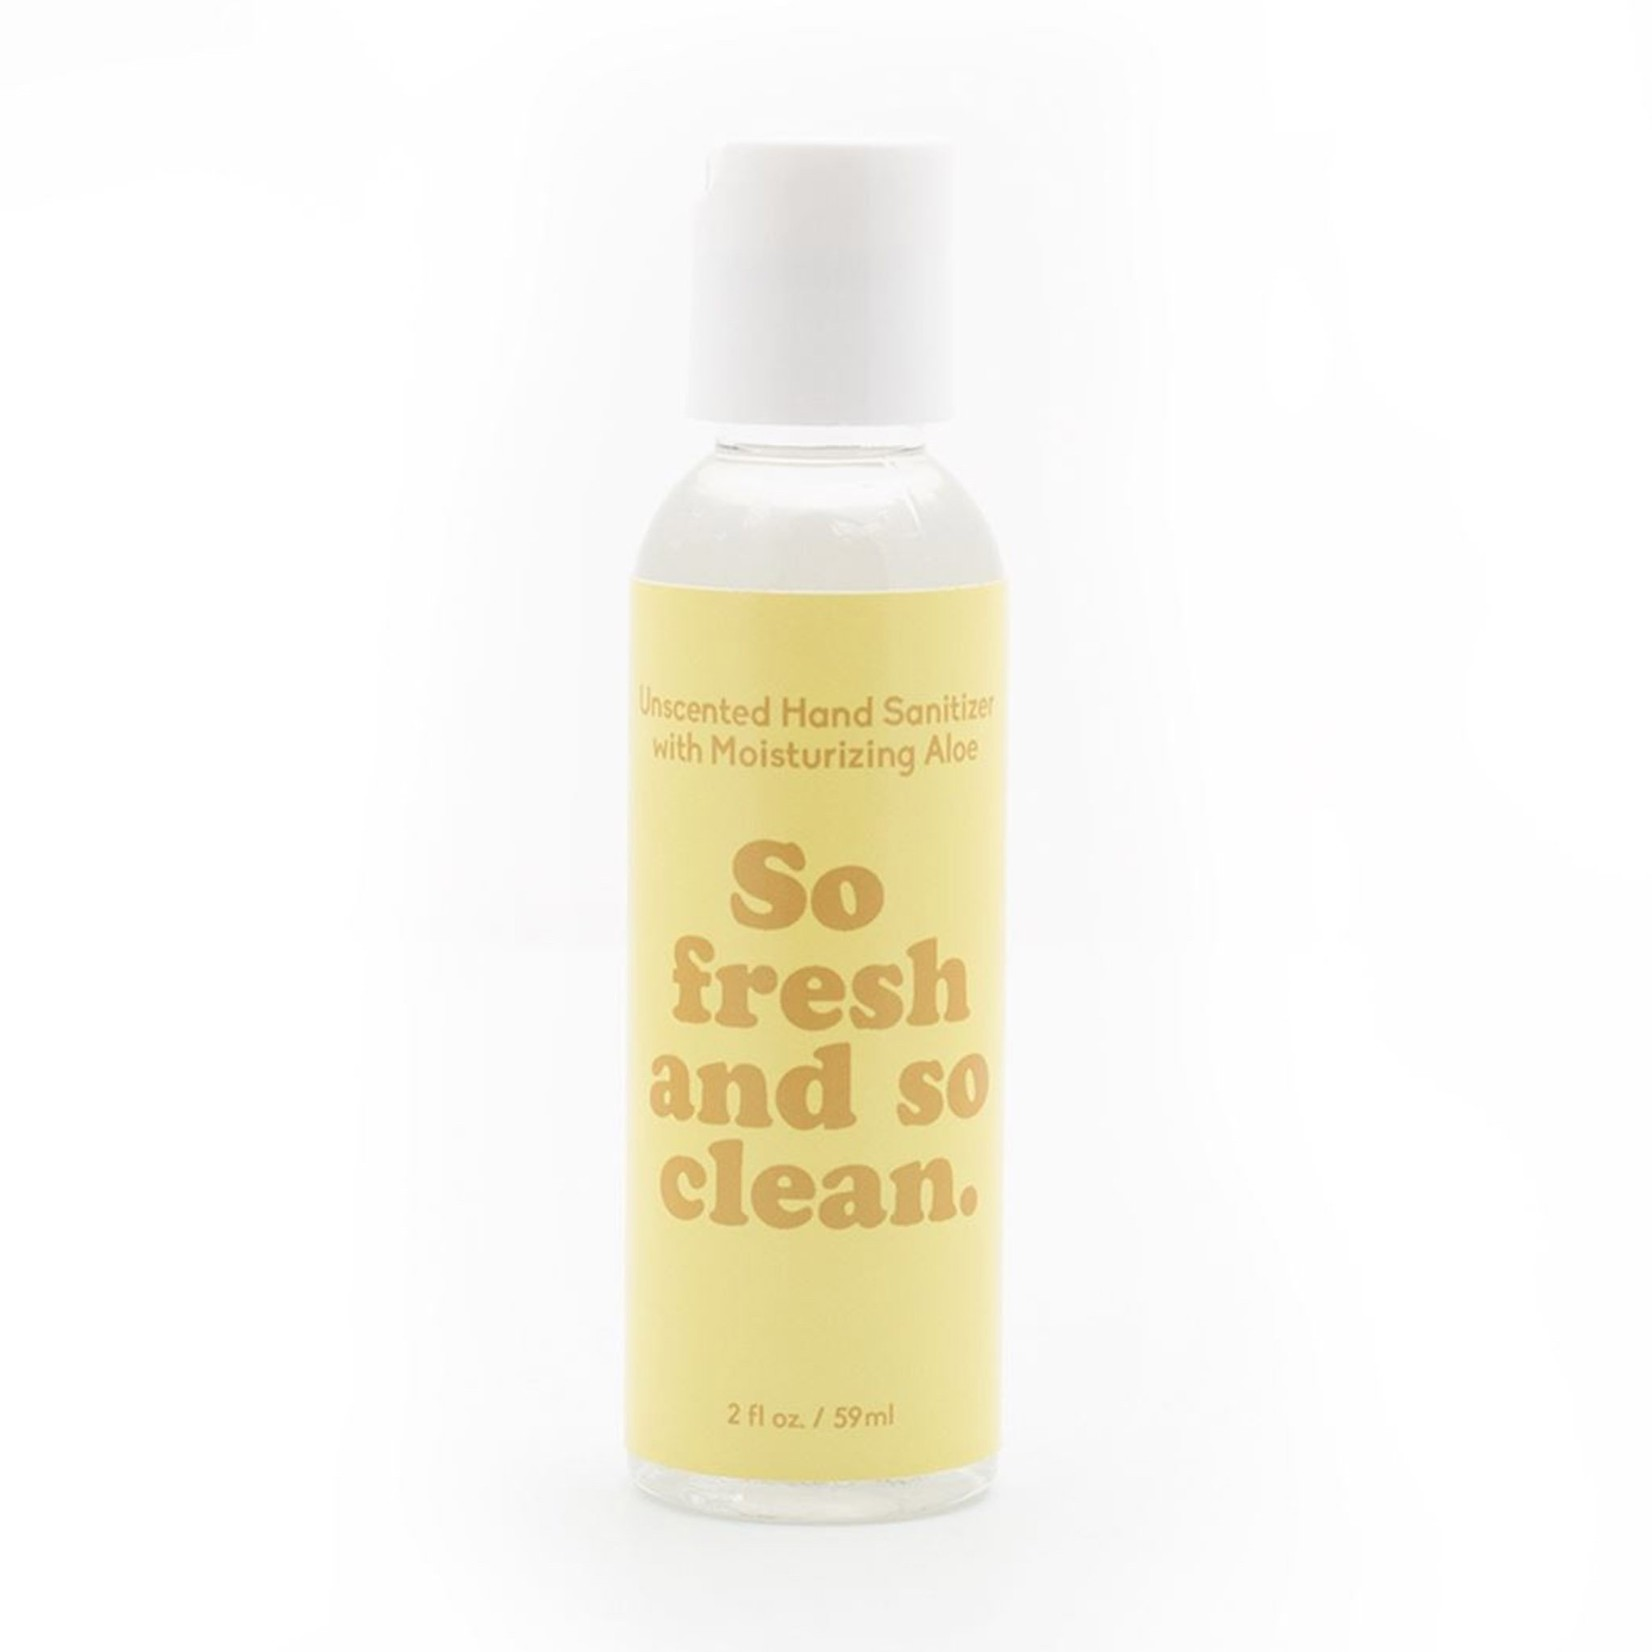 So Fresh & So Clean Hand Sanitizer